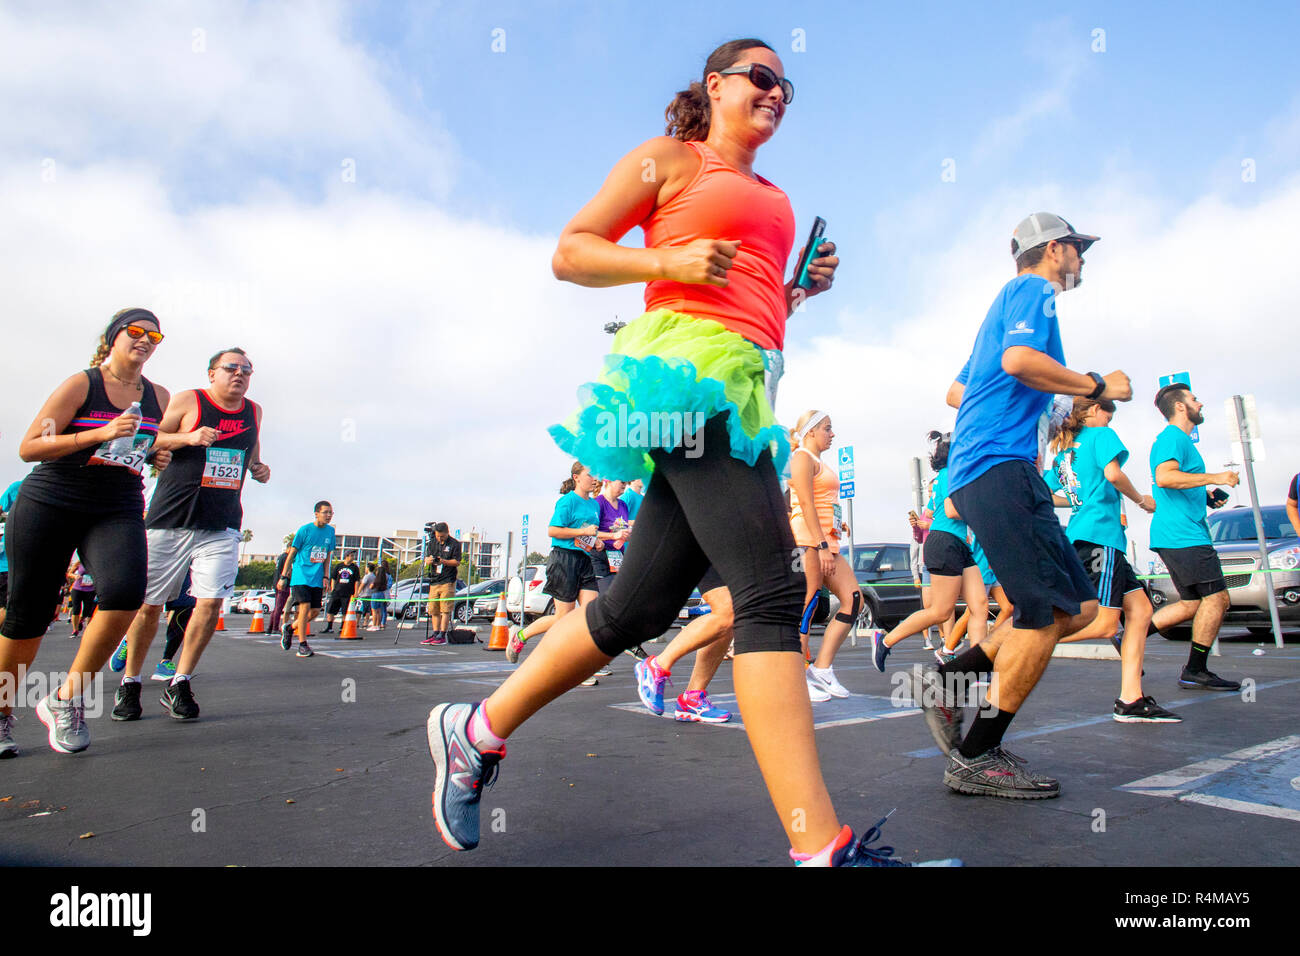 Participants in a 5K 'Fun Run' race through a fairground parking lot in Costa Mesa, CA. - Stock Photo